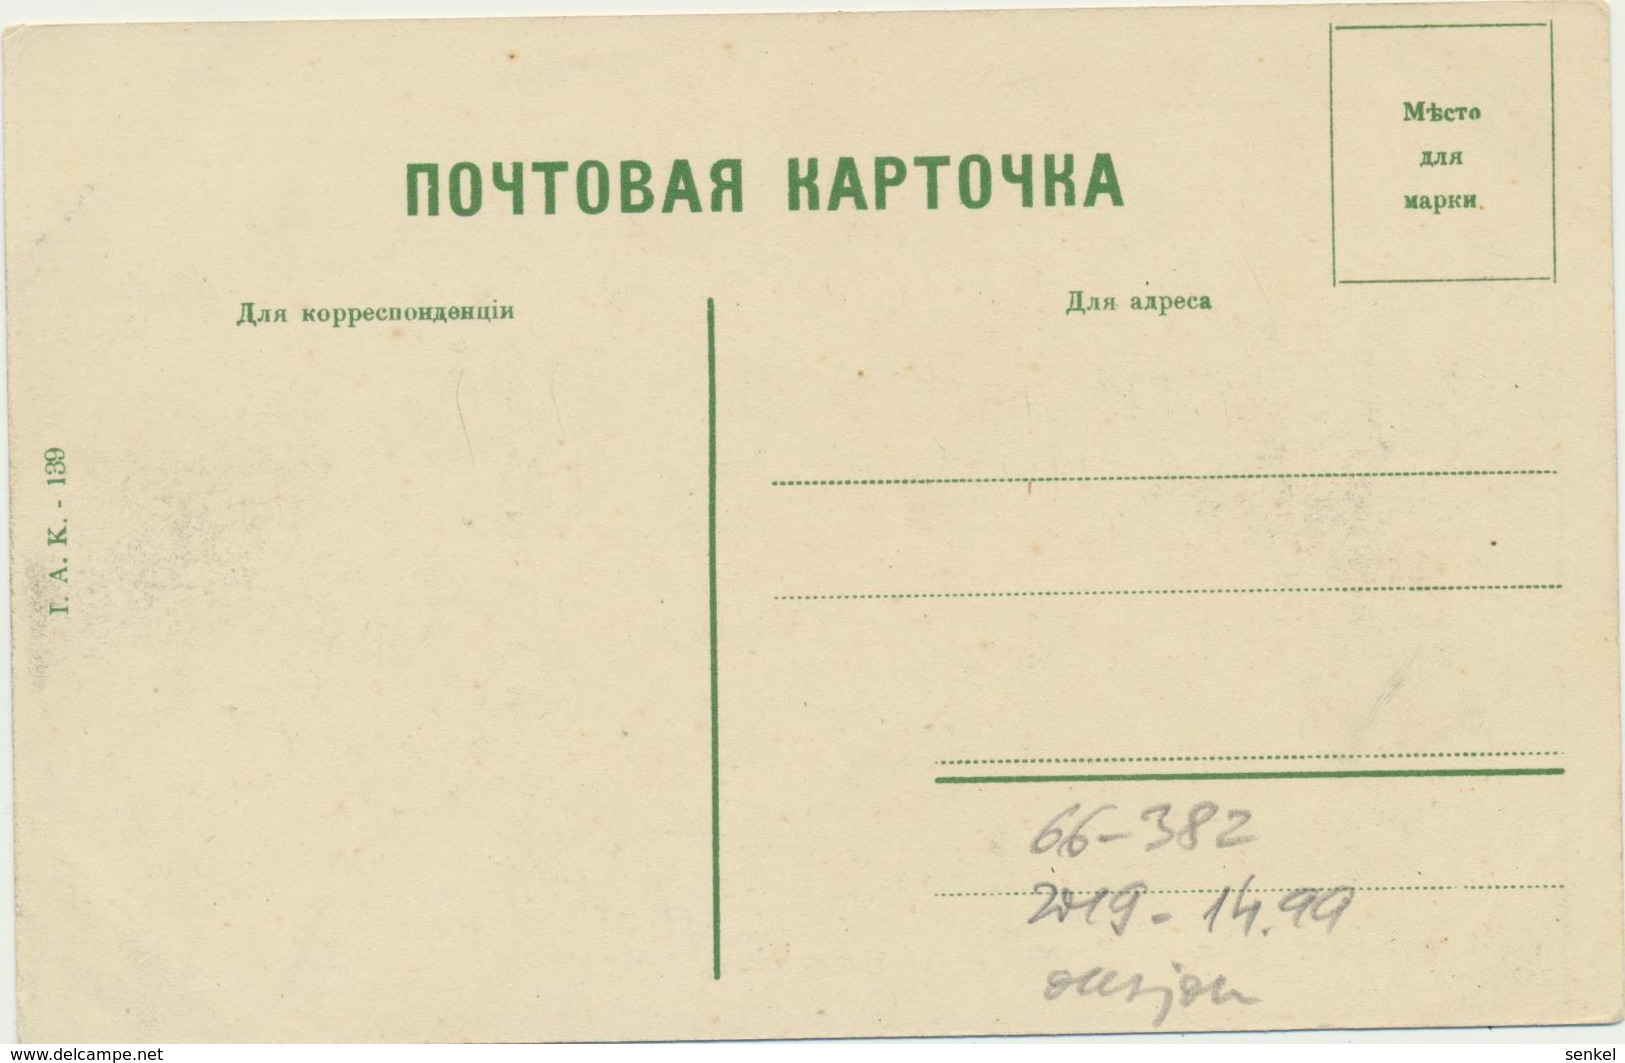 66-382 Россия Russland Russia Caucasia Jessentuki Essentuki - Russie